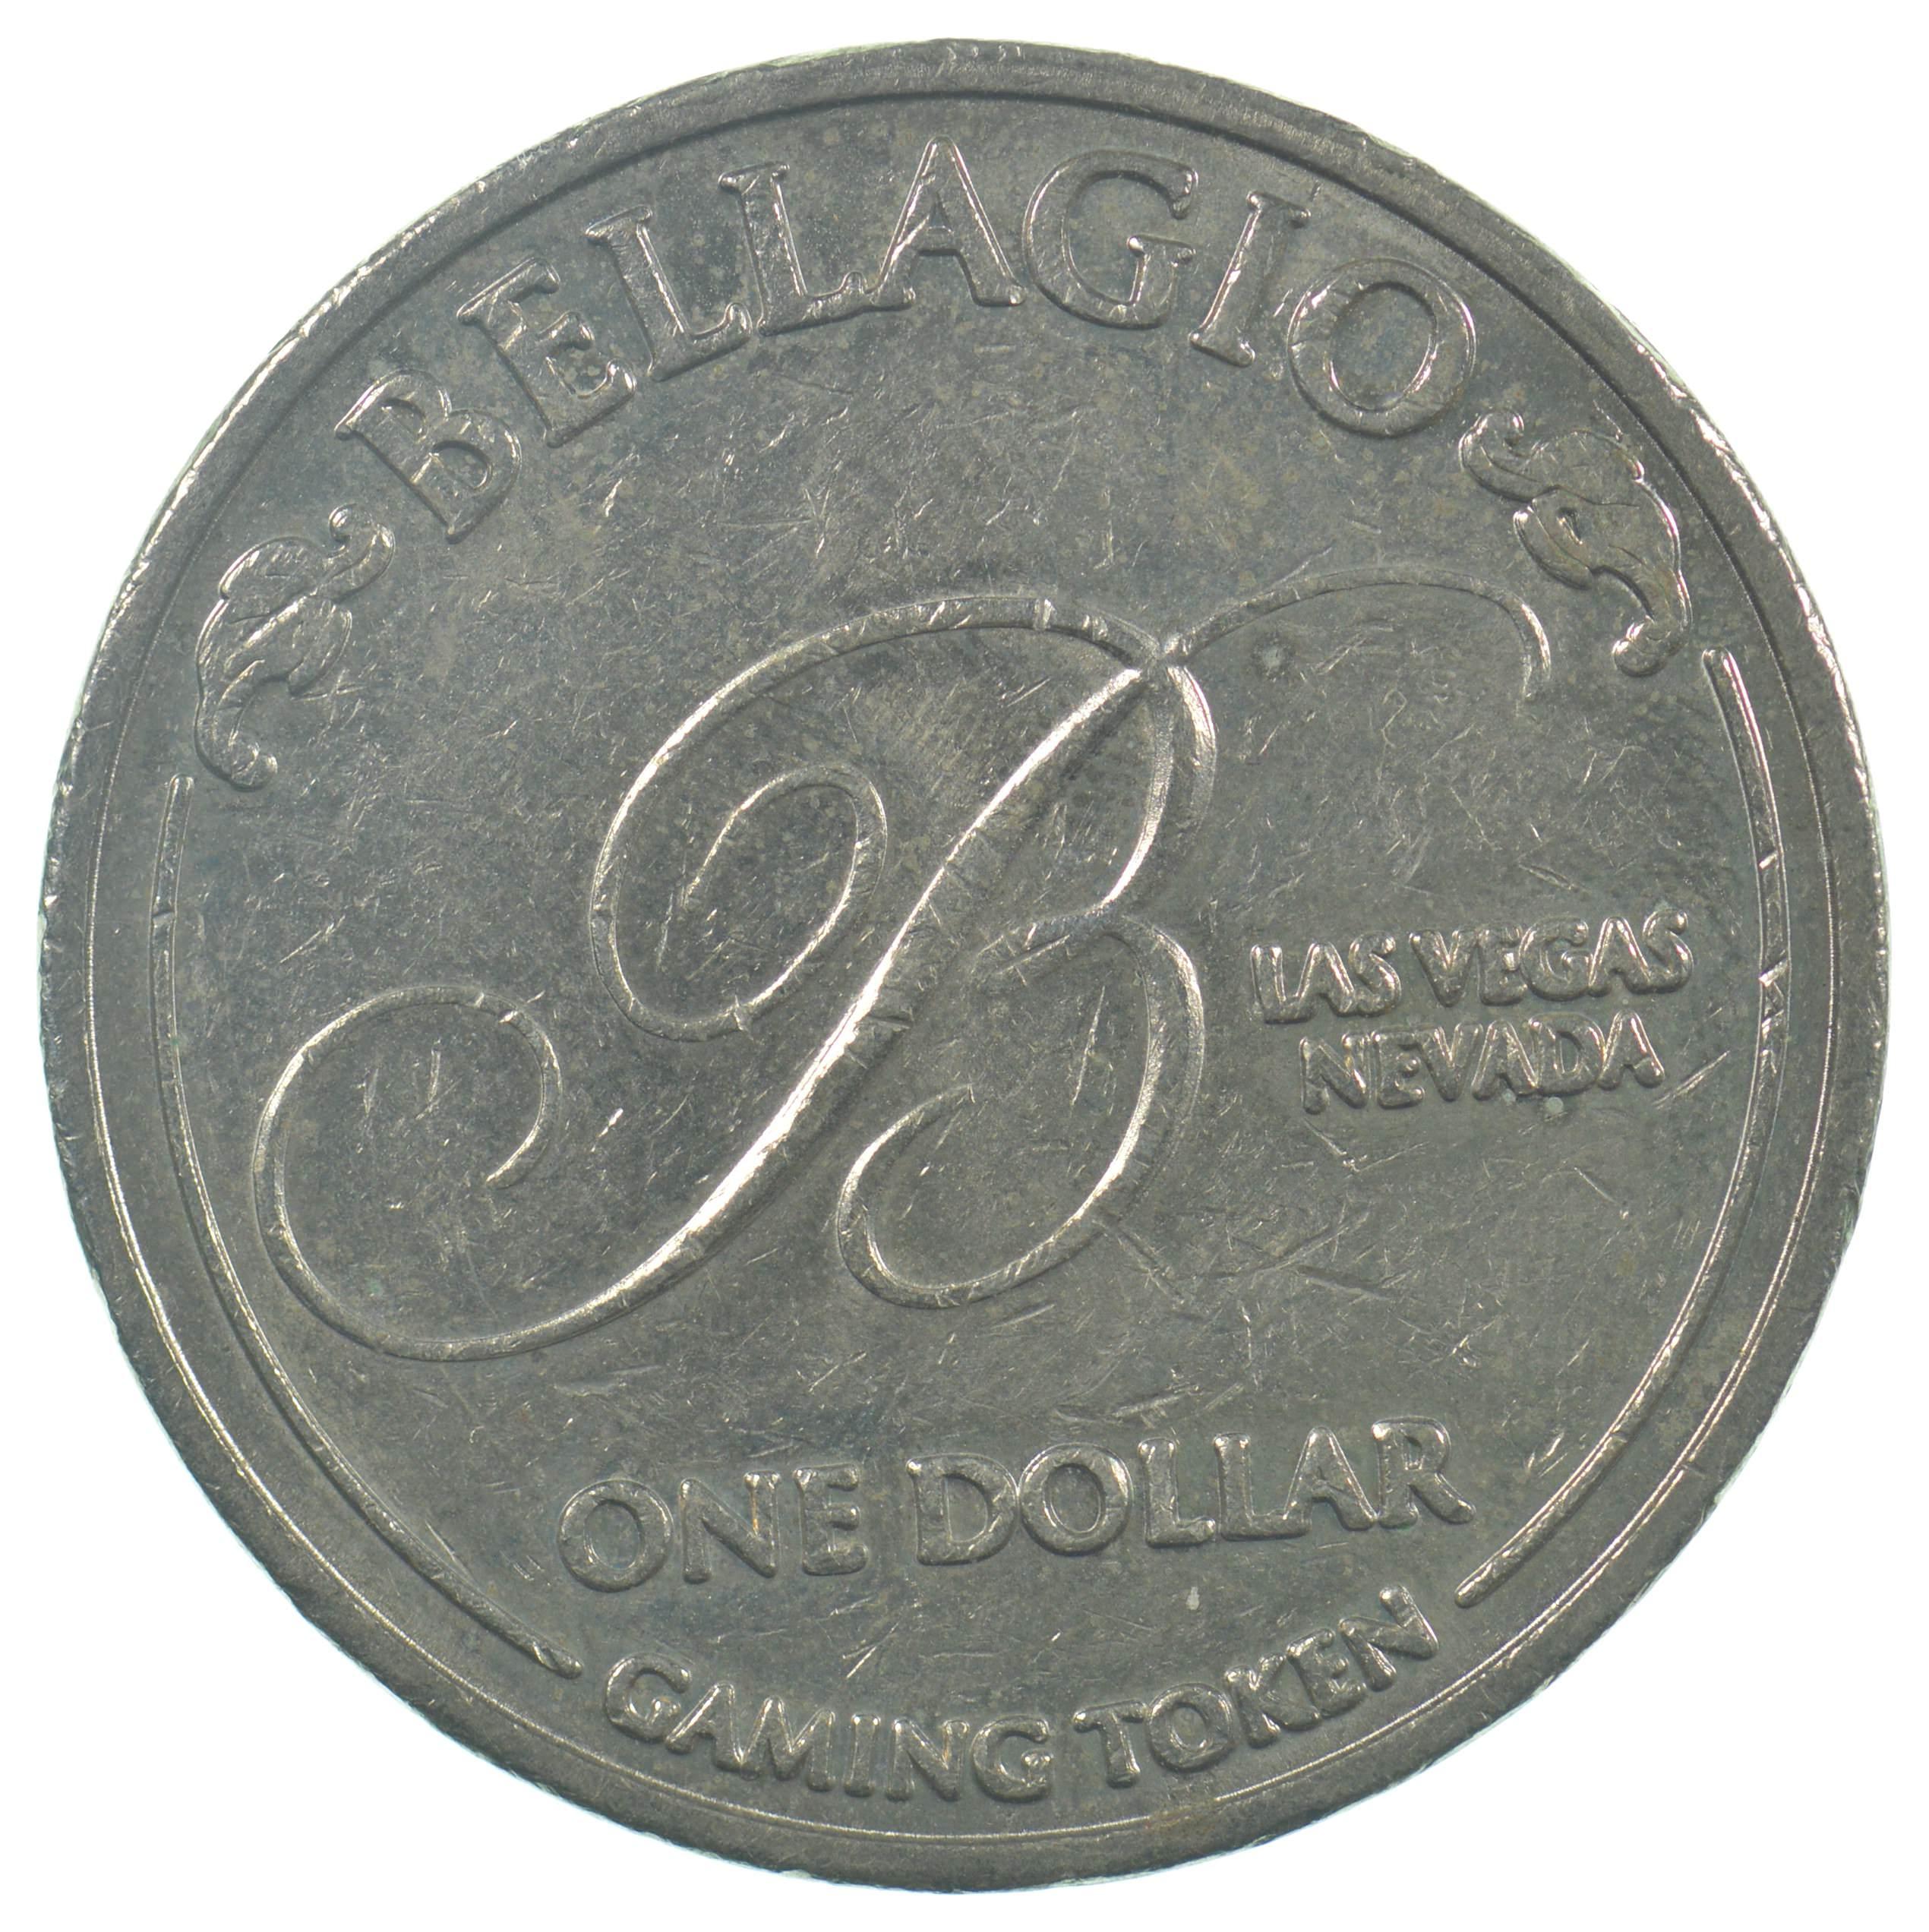 BELLAGIO  LAS VEGAS  NEVADA   $5.00  GAMING TOKEN